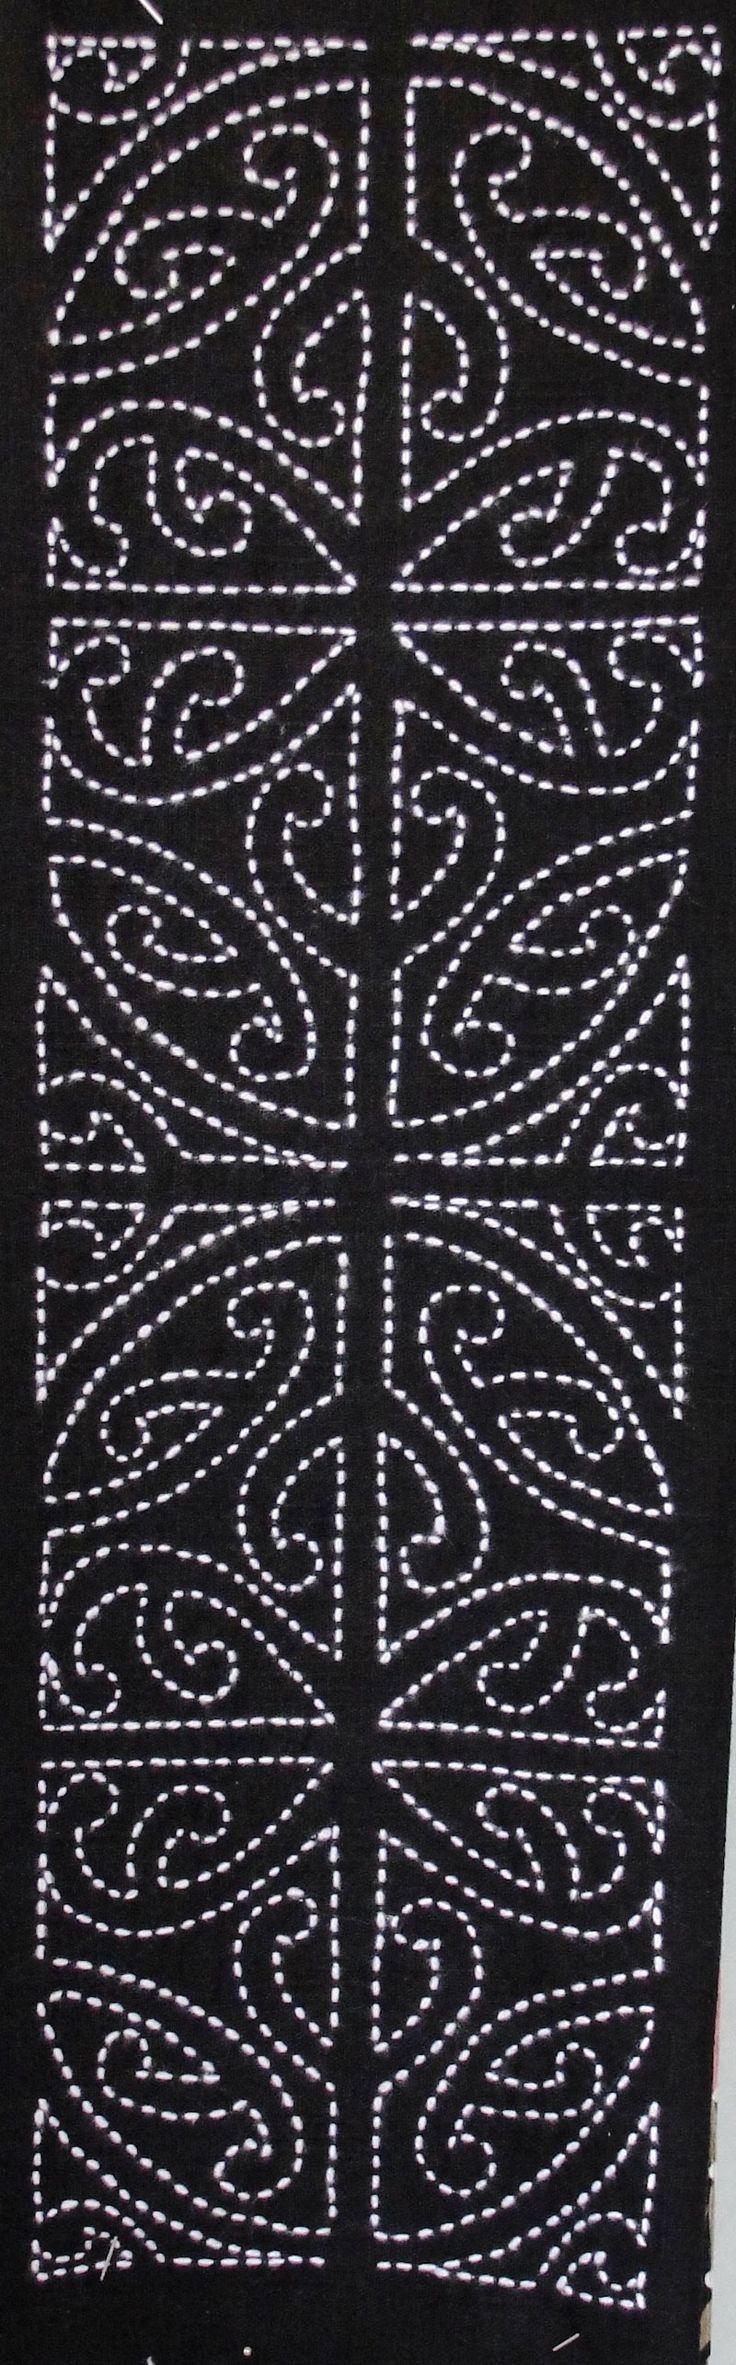 maori-design.jpg (800×2571)